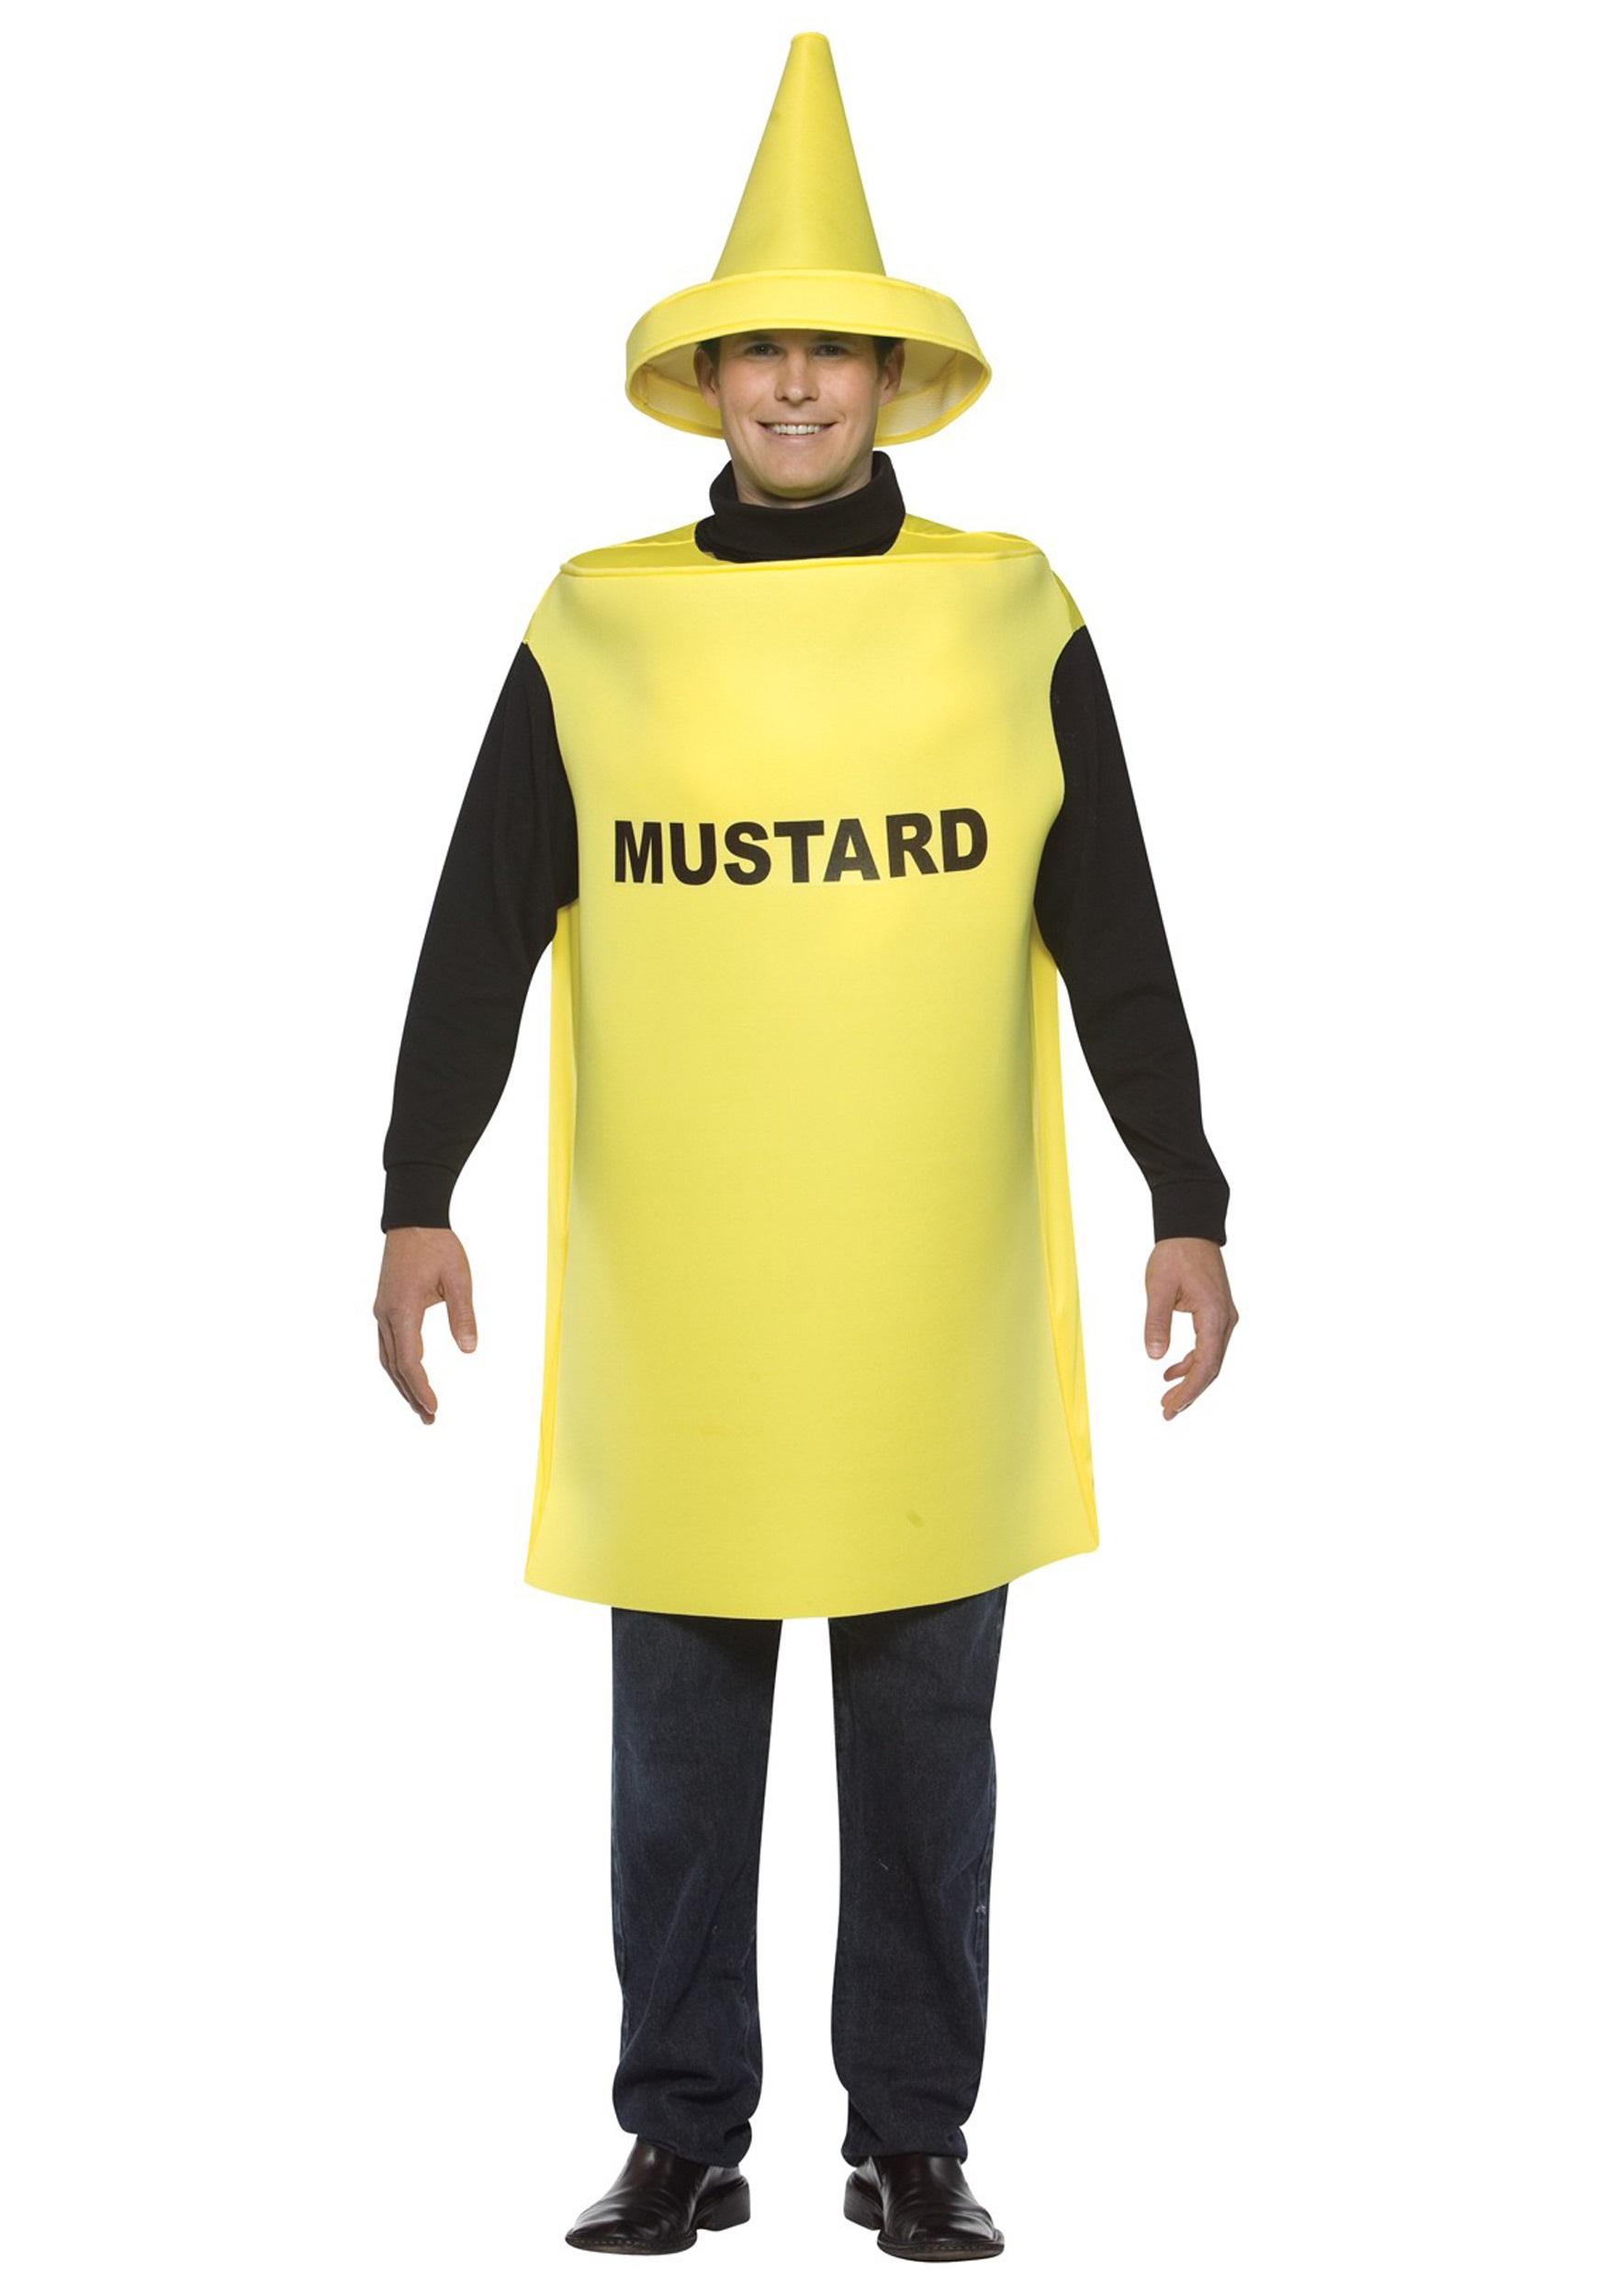 Mustard Costume  sc 1 st  Halloween Costume & Mustard Costume - Adult Mustard and Ketchup Costumes